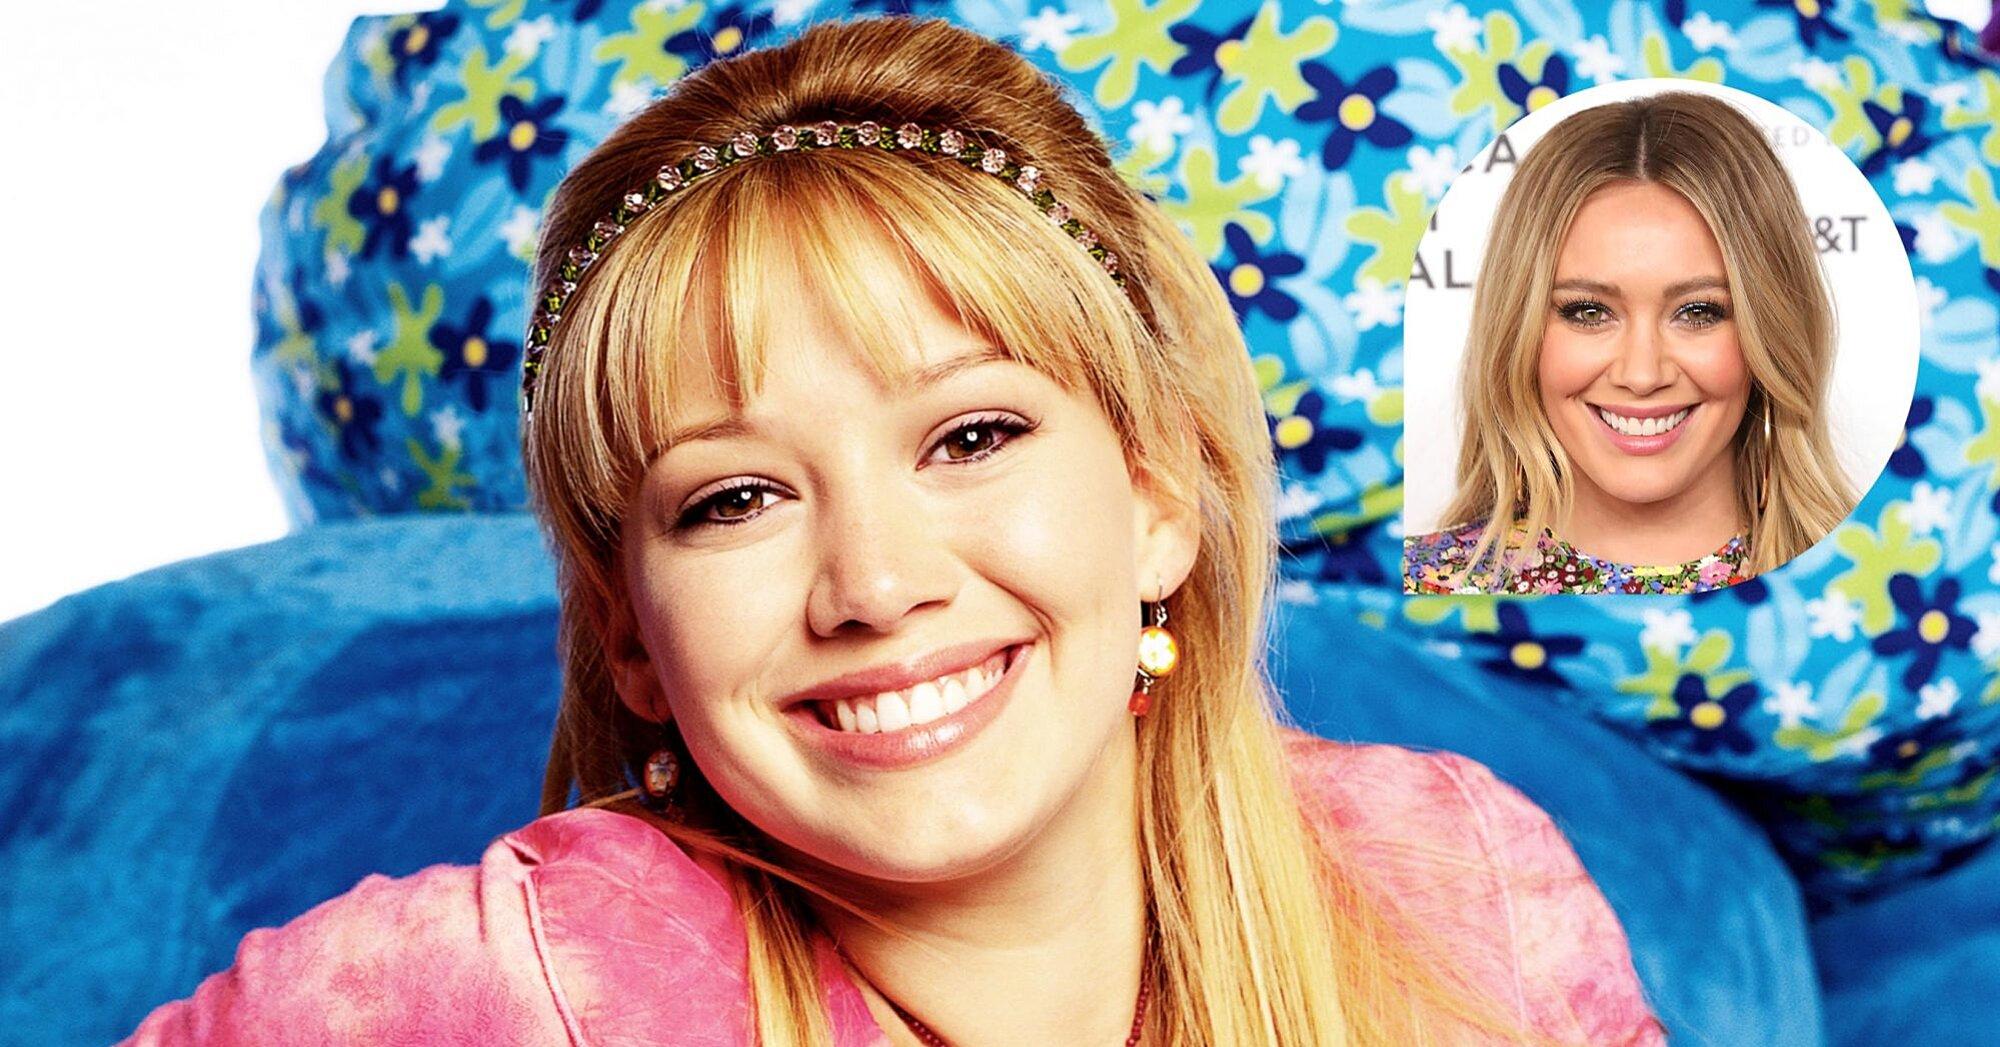 Hilary Duff On The Lizzie Mcguire Disney Revival Reaction Ew Com